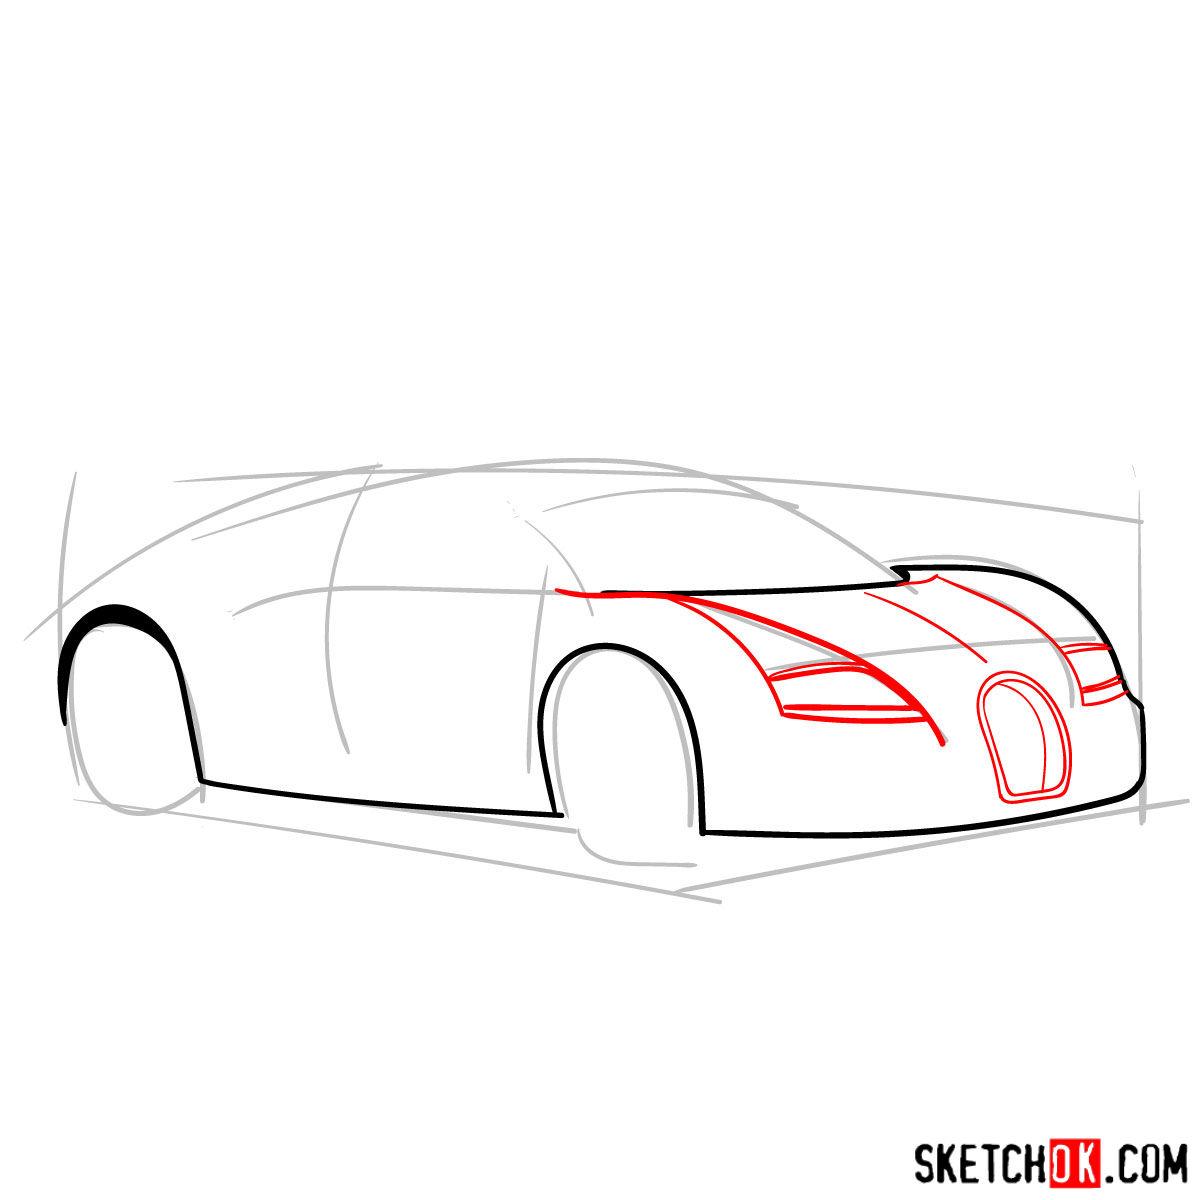 How to draw Bugatti Veyron 16.4 Super Sport - step 04